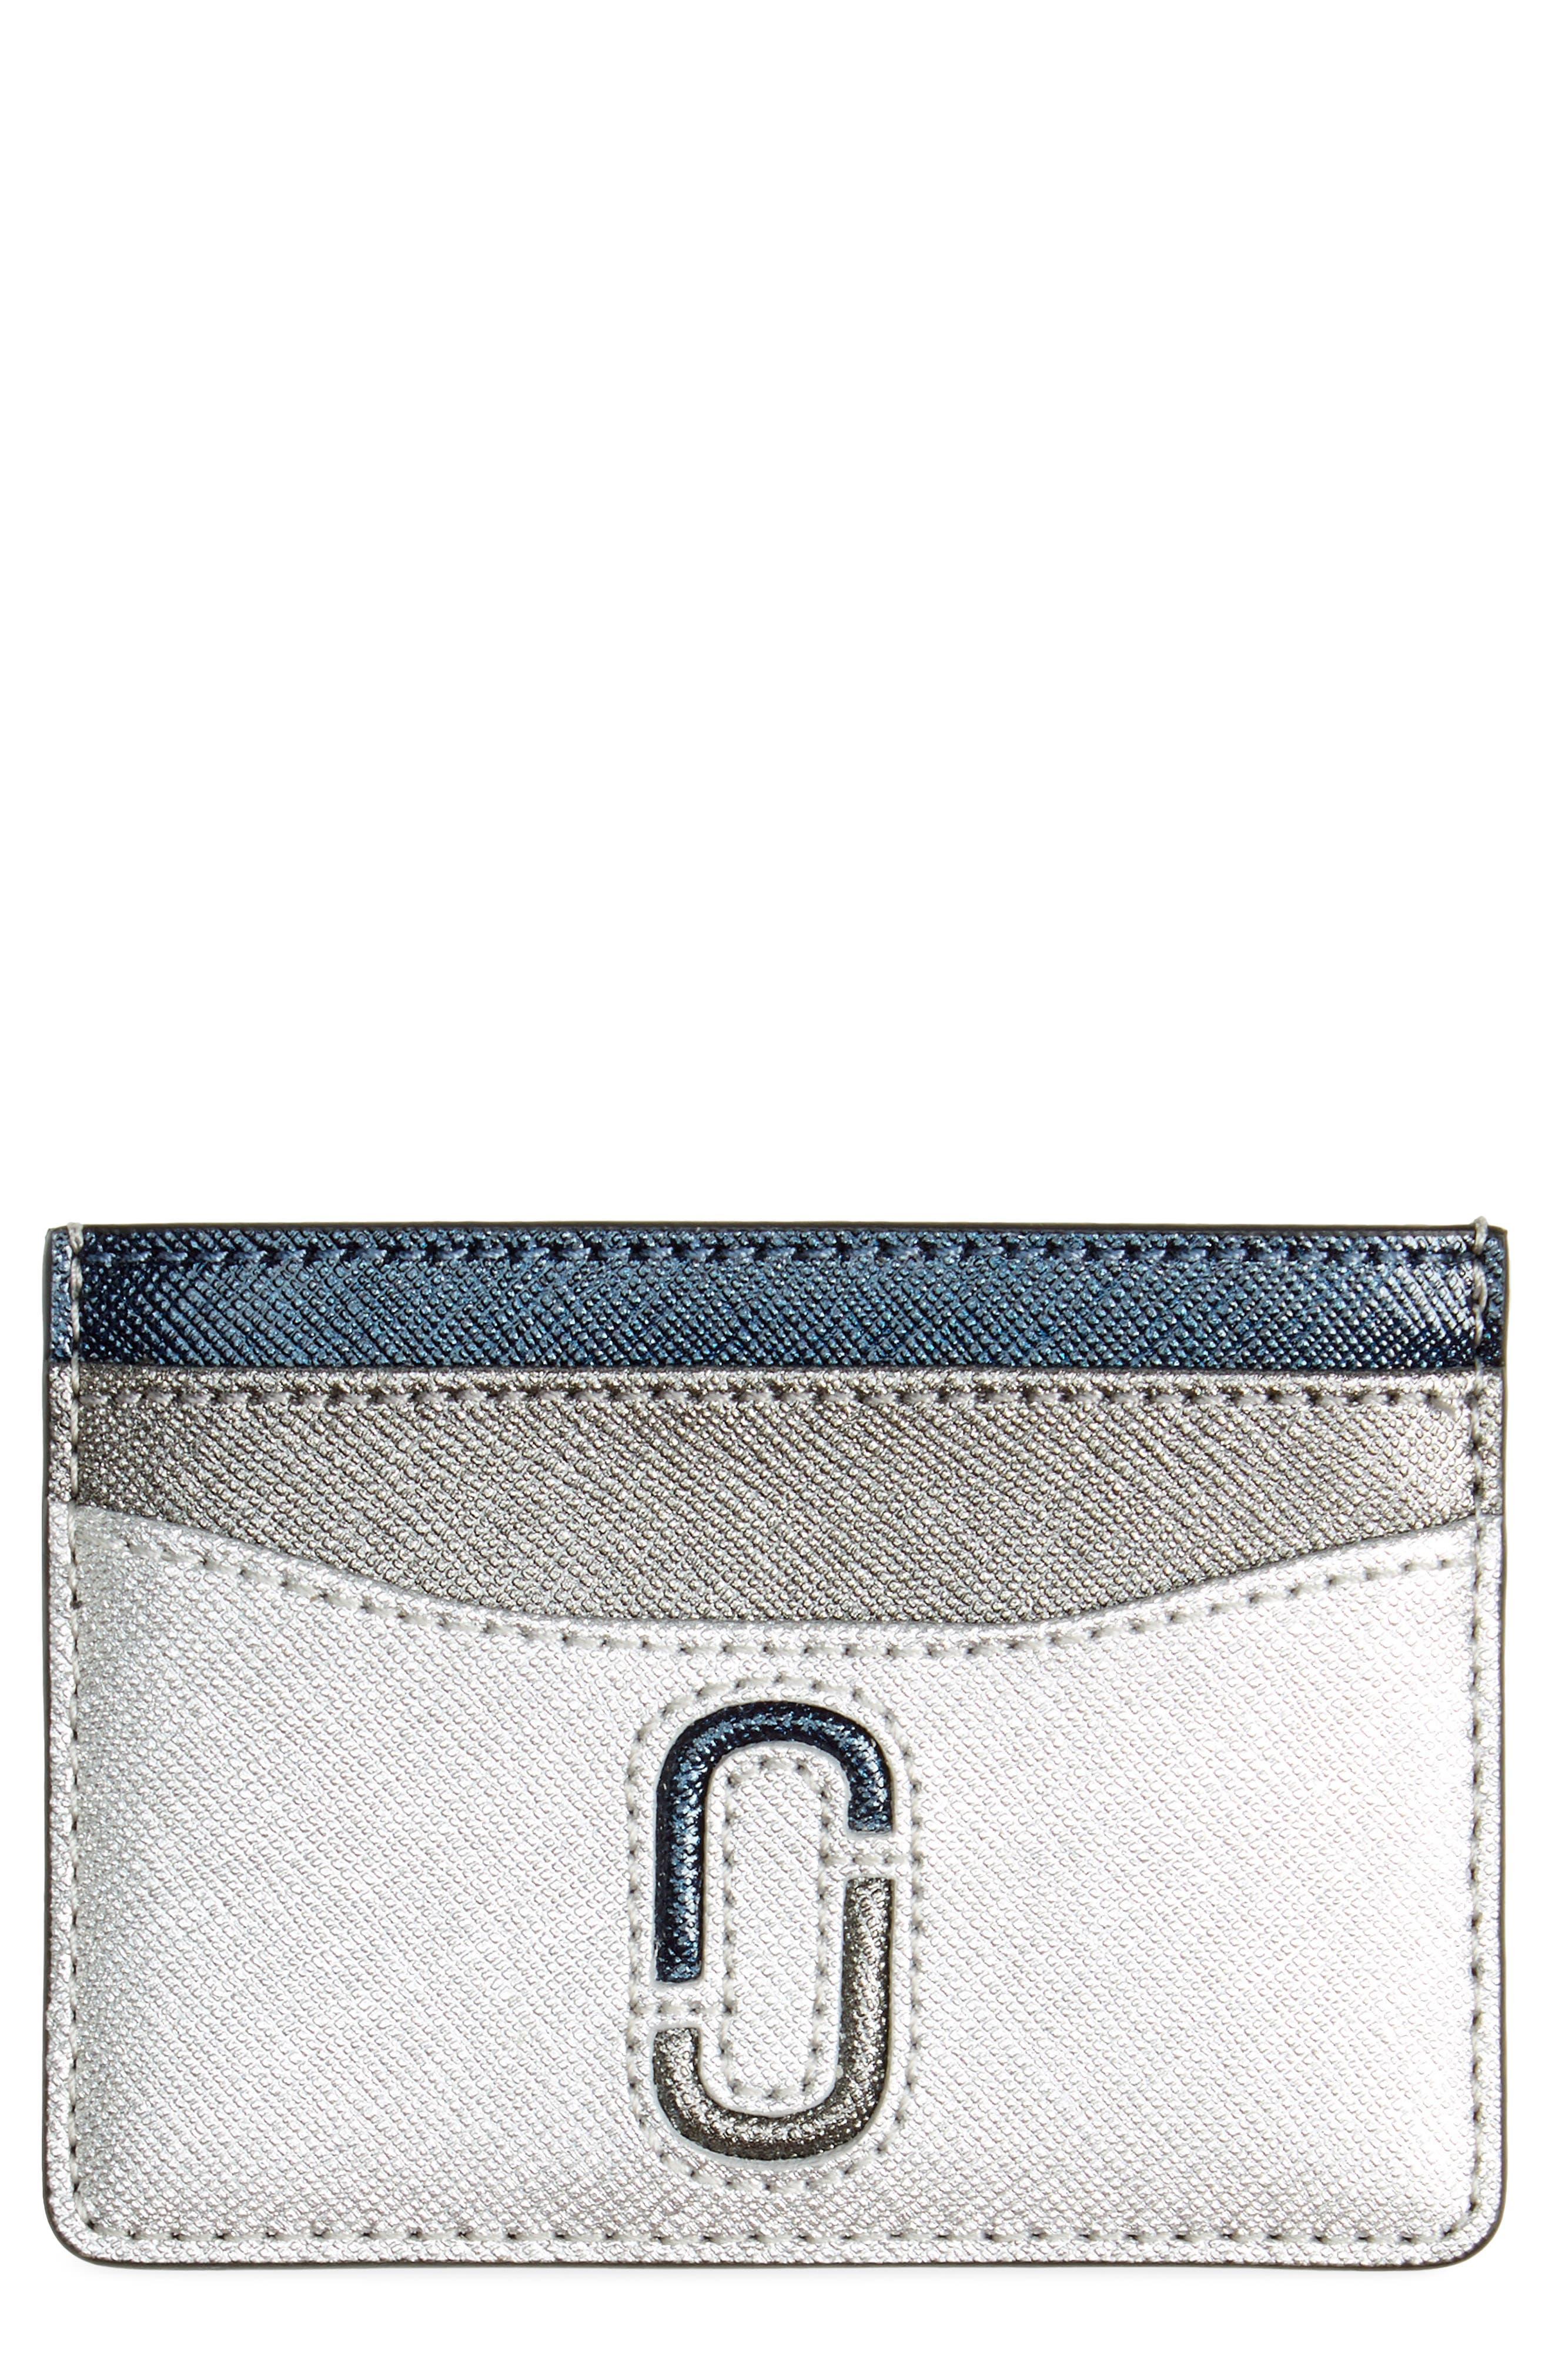 Snapshot Saffiano Leather Card Case,                             Main thumbnail 1, color,                             040